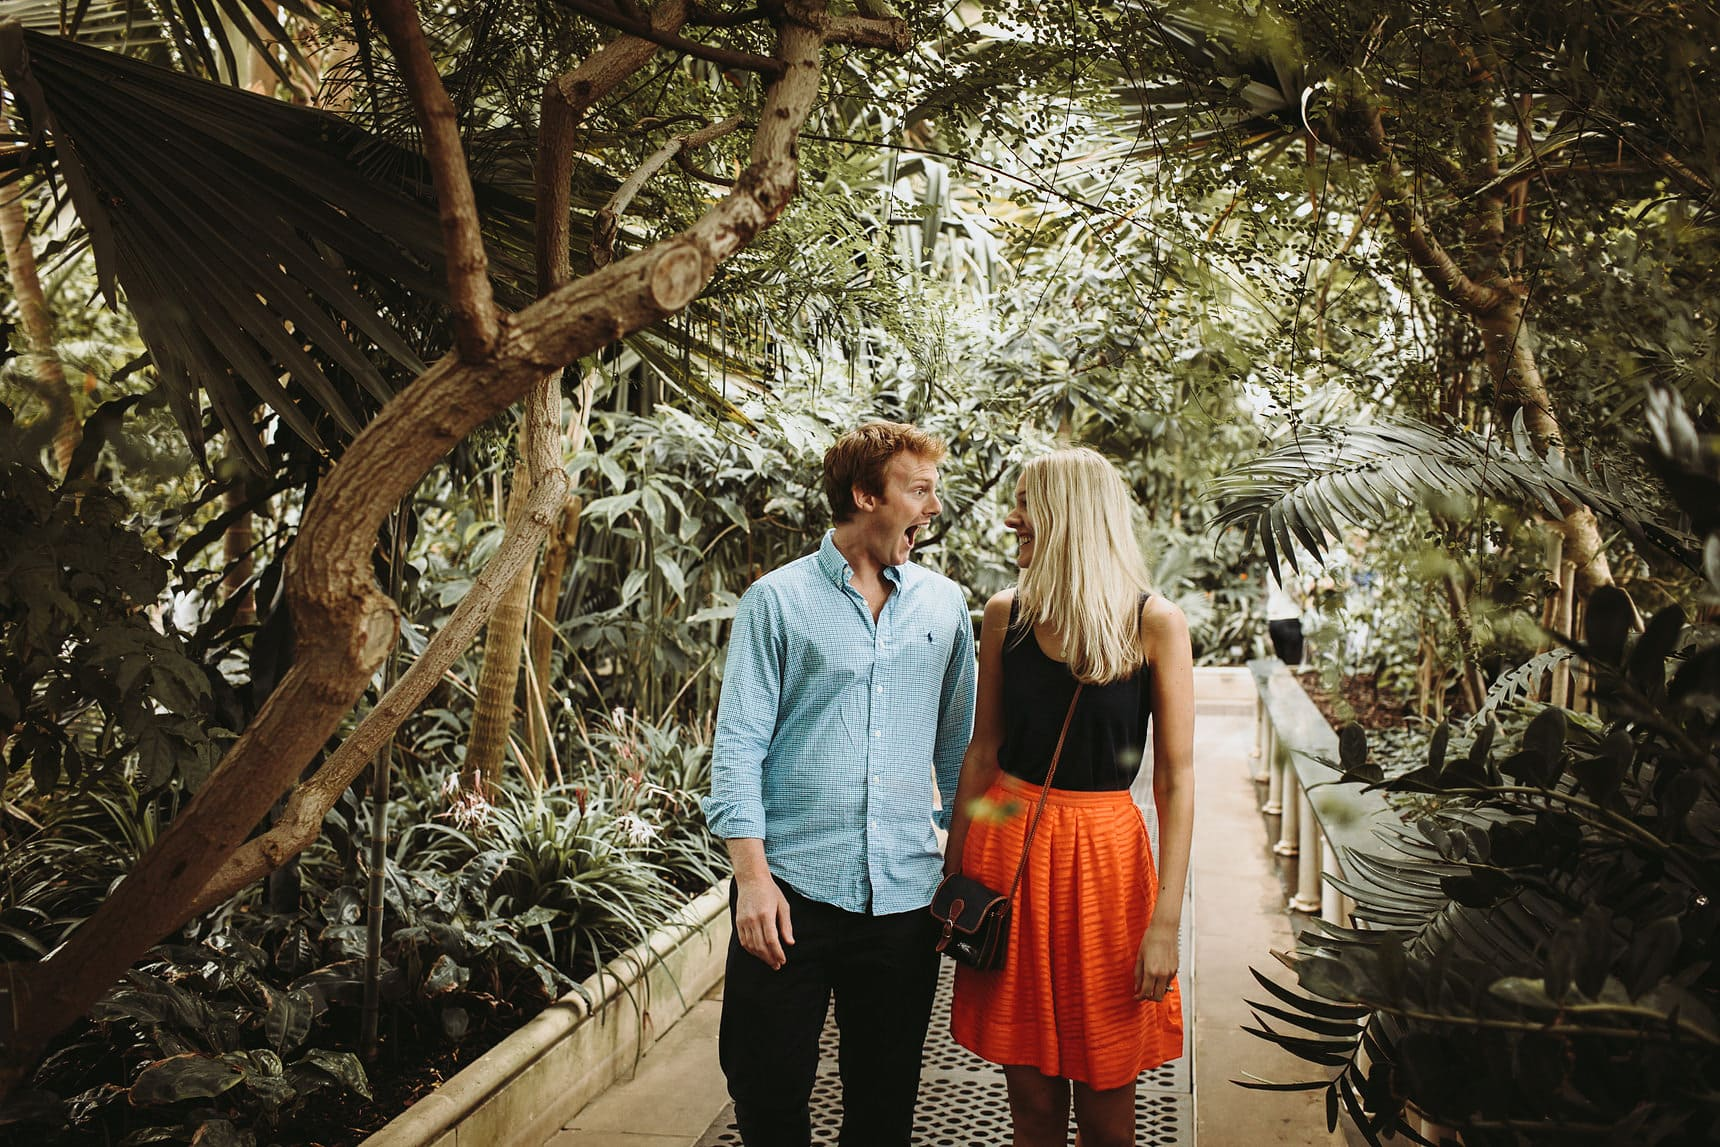 Kew Gardens Wedding Photographer | London Wedding Photography